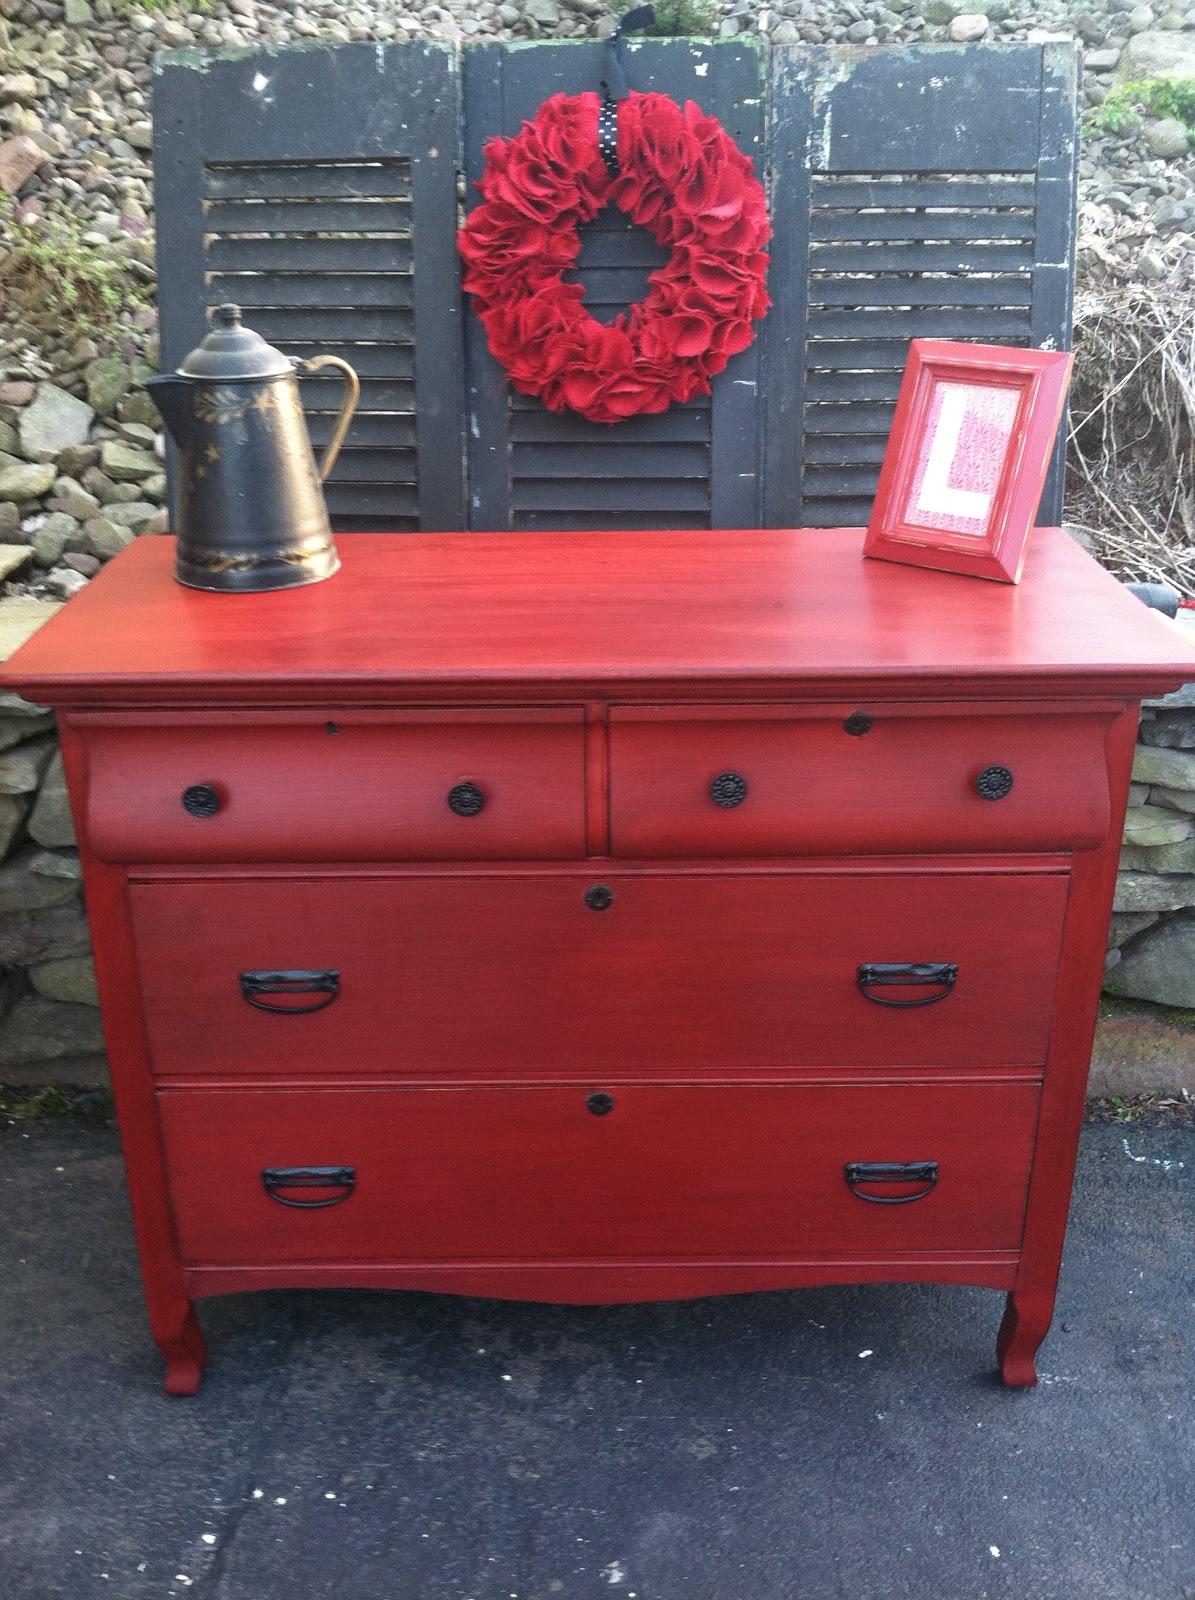 Antique Dresser Makeover From Drab to Fab  Meet Red Hot Rhetta